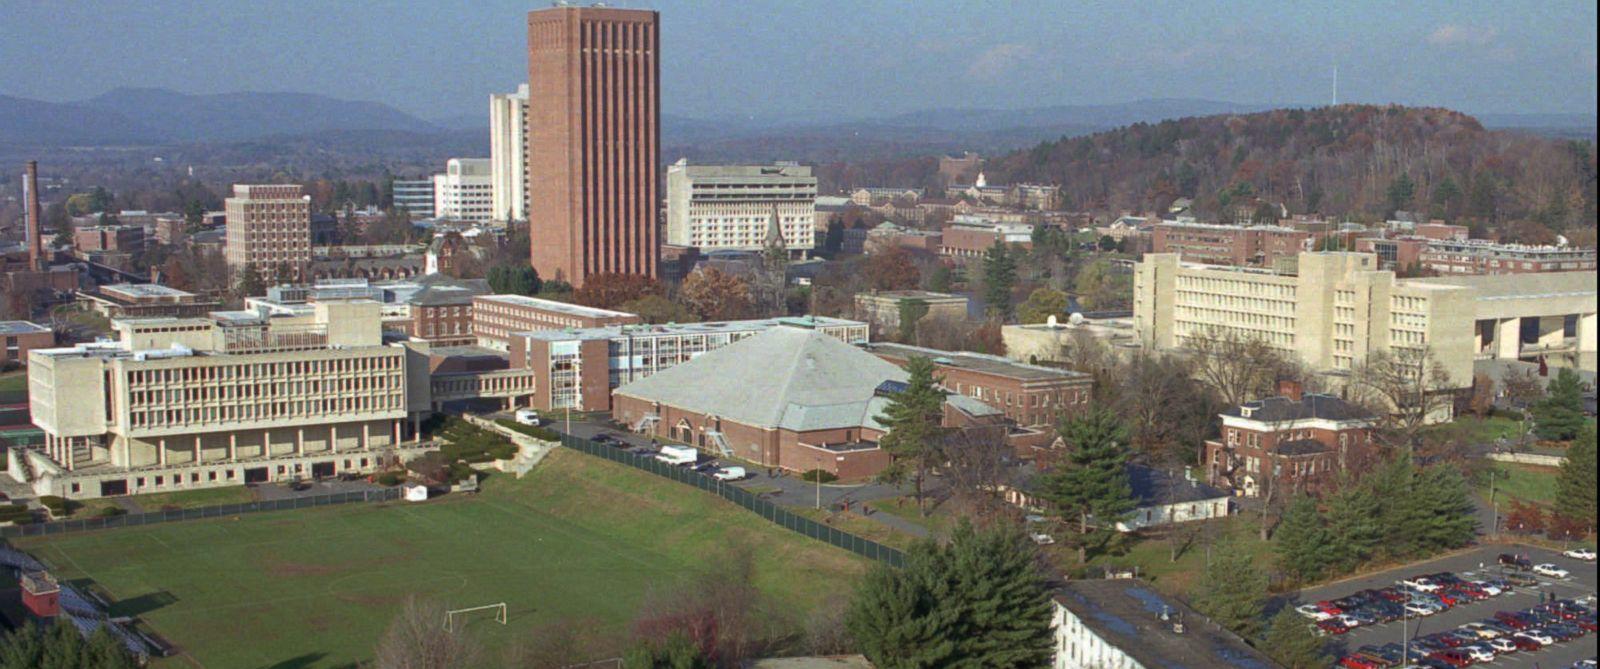 PHOTO: UMass at Amherst Campus.